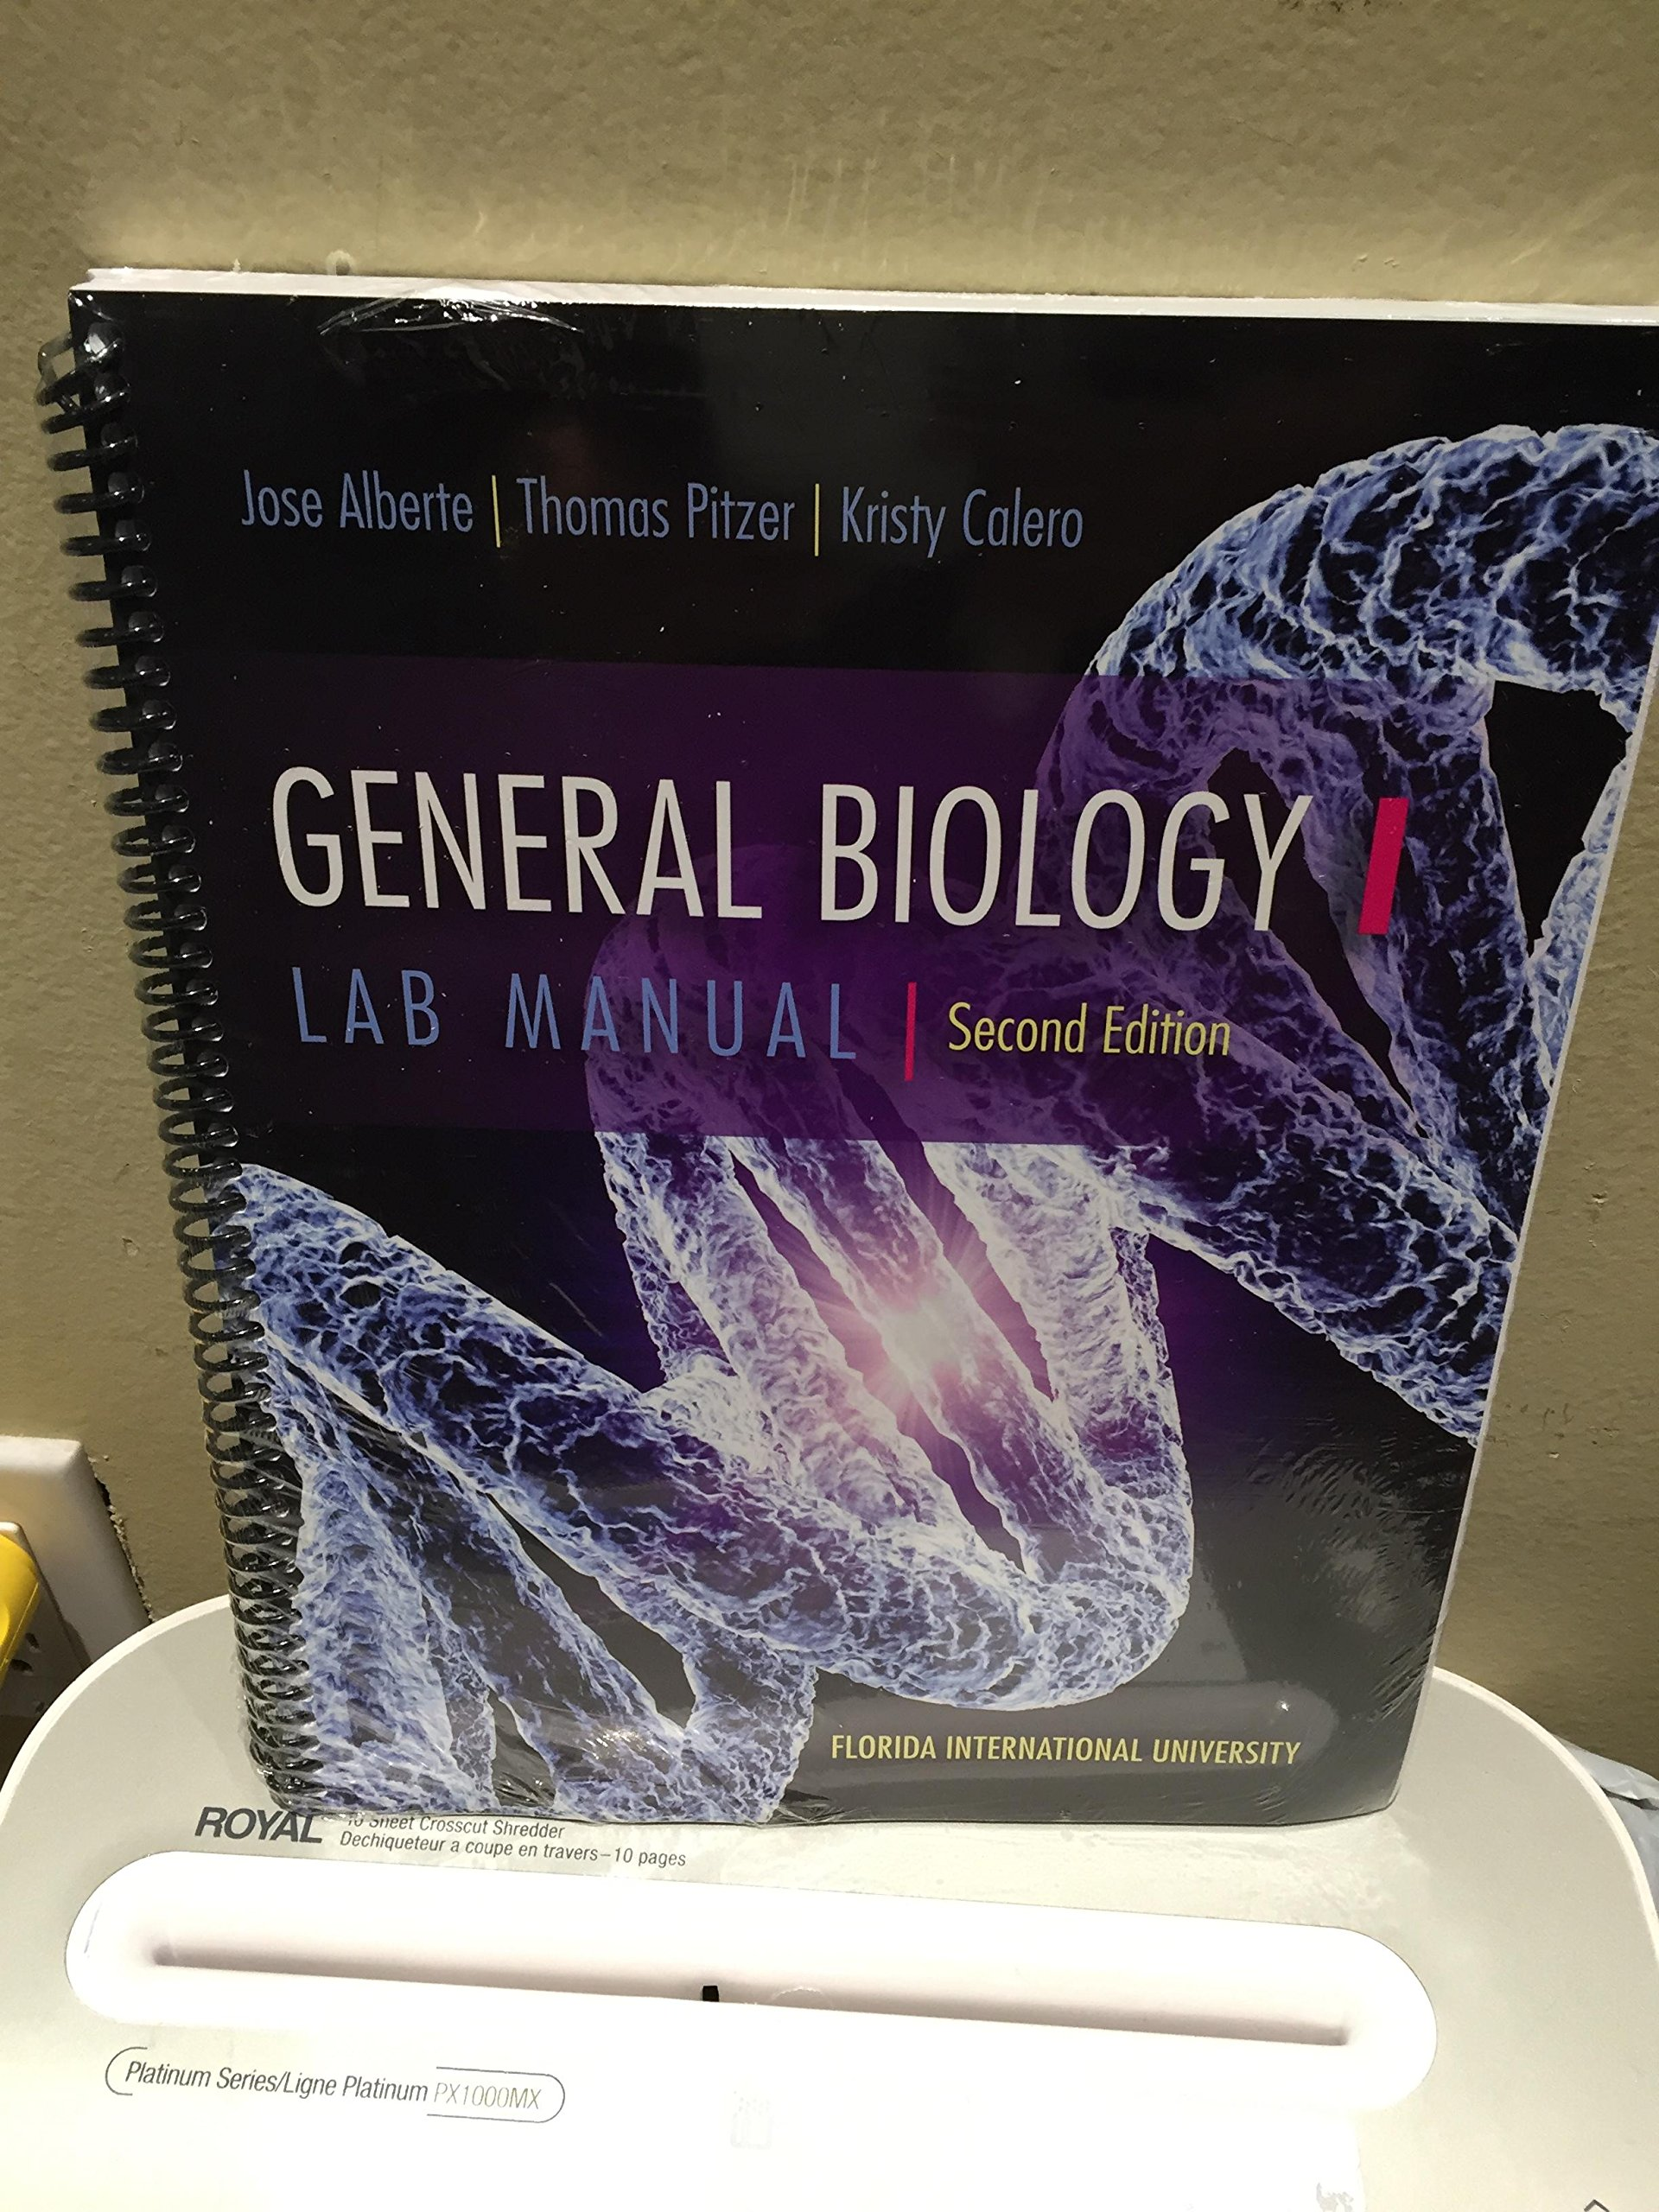 General Biology 1 Lab Manual Second Edition: Jose Alberte, Thomas Pitzer,  Kristy Calero: 9781259158841: Amazon.com: Books